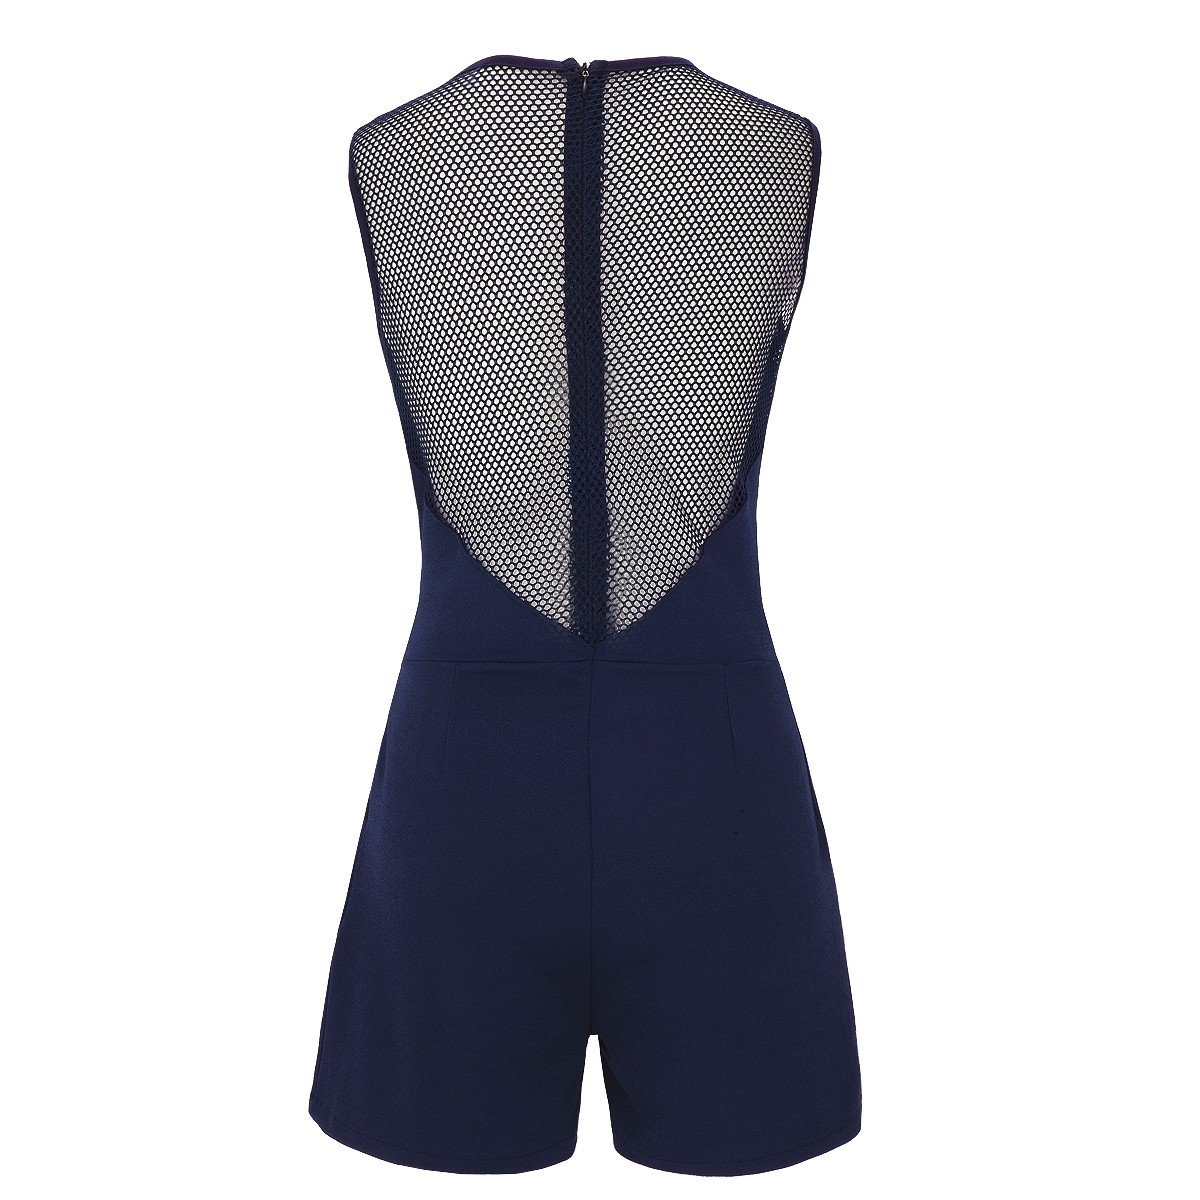 cf499cdb7c89d2 Laeticia Dreams Damen Overall Jumpsuit Catsuit Einteiler Kurz Ärmellos Netz  S M L XL: Amazon.de: Bekleidung